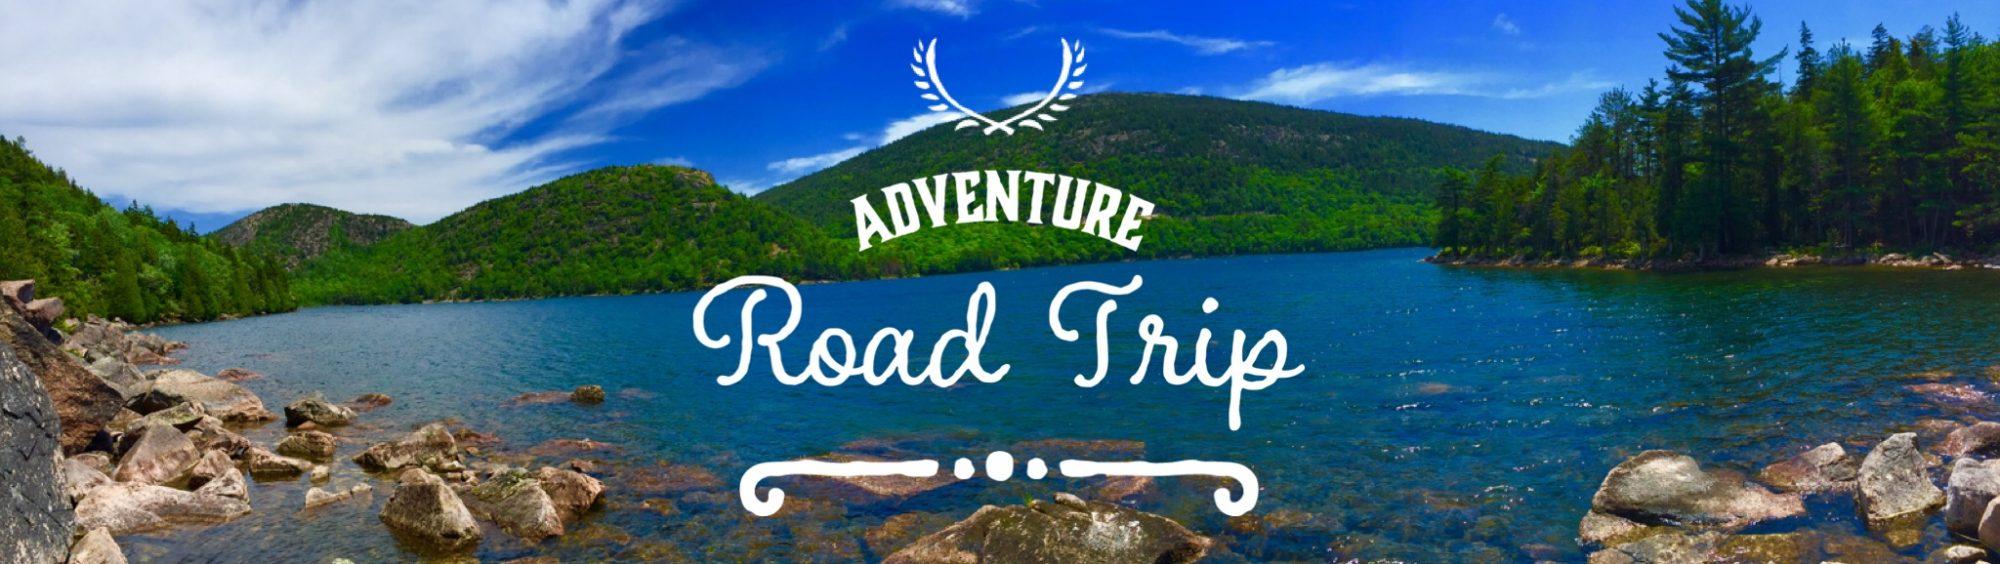 Adventure Road Trip